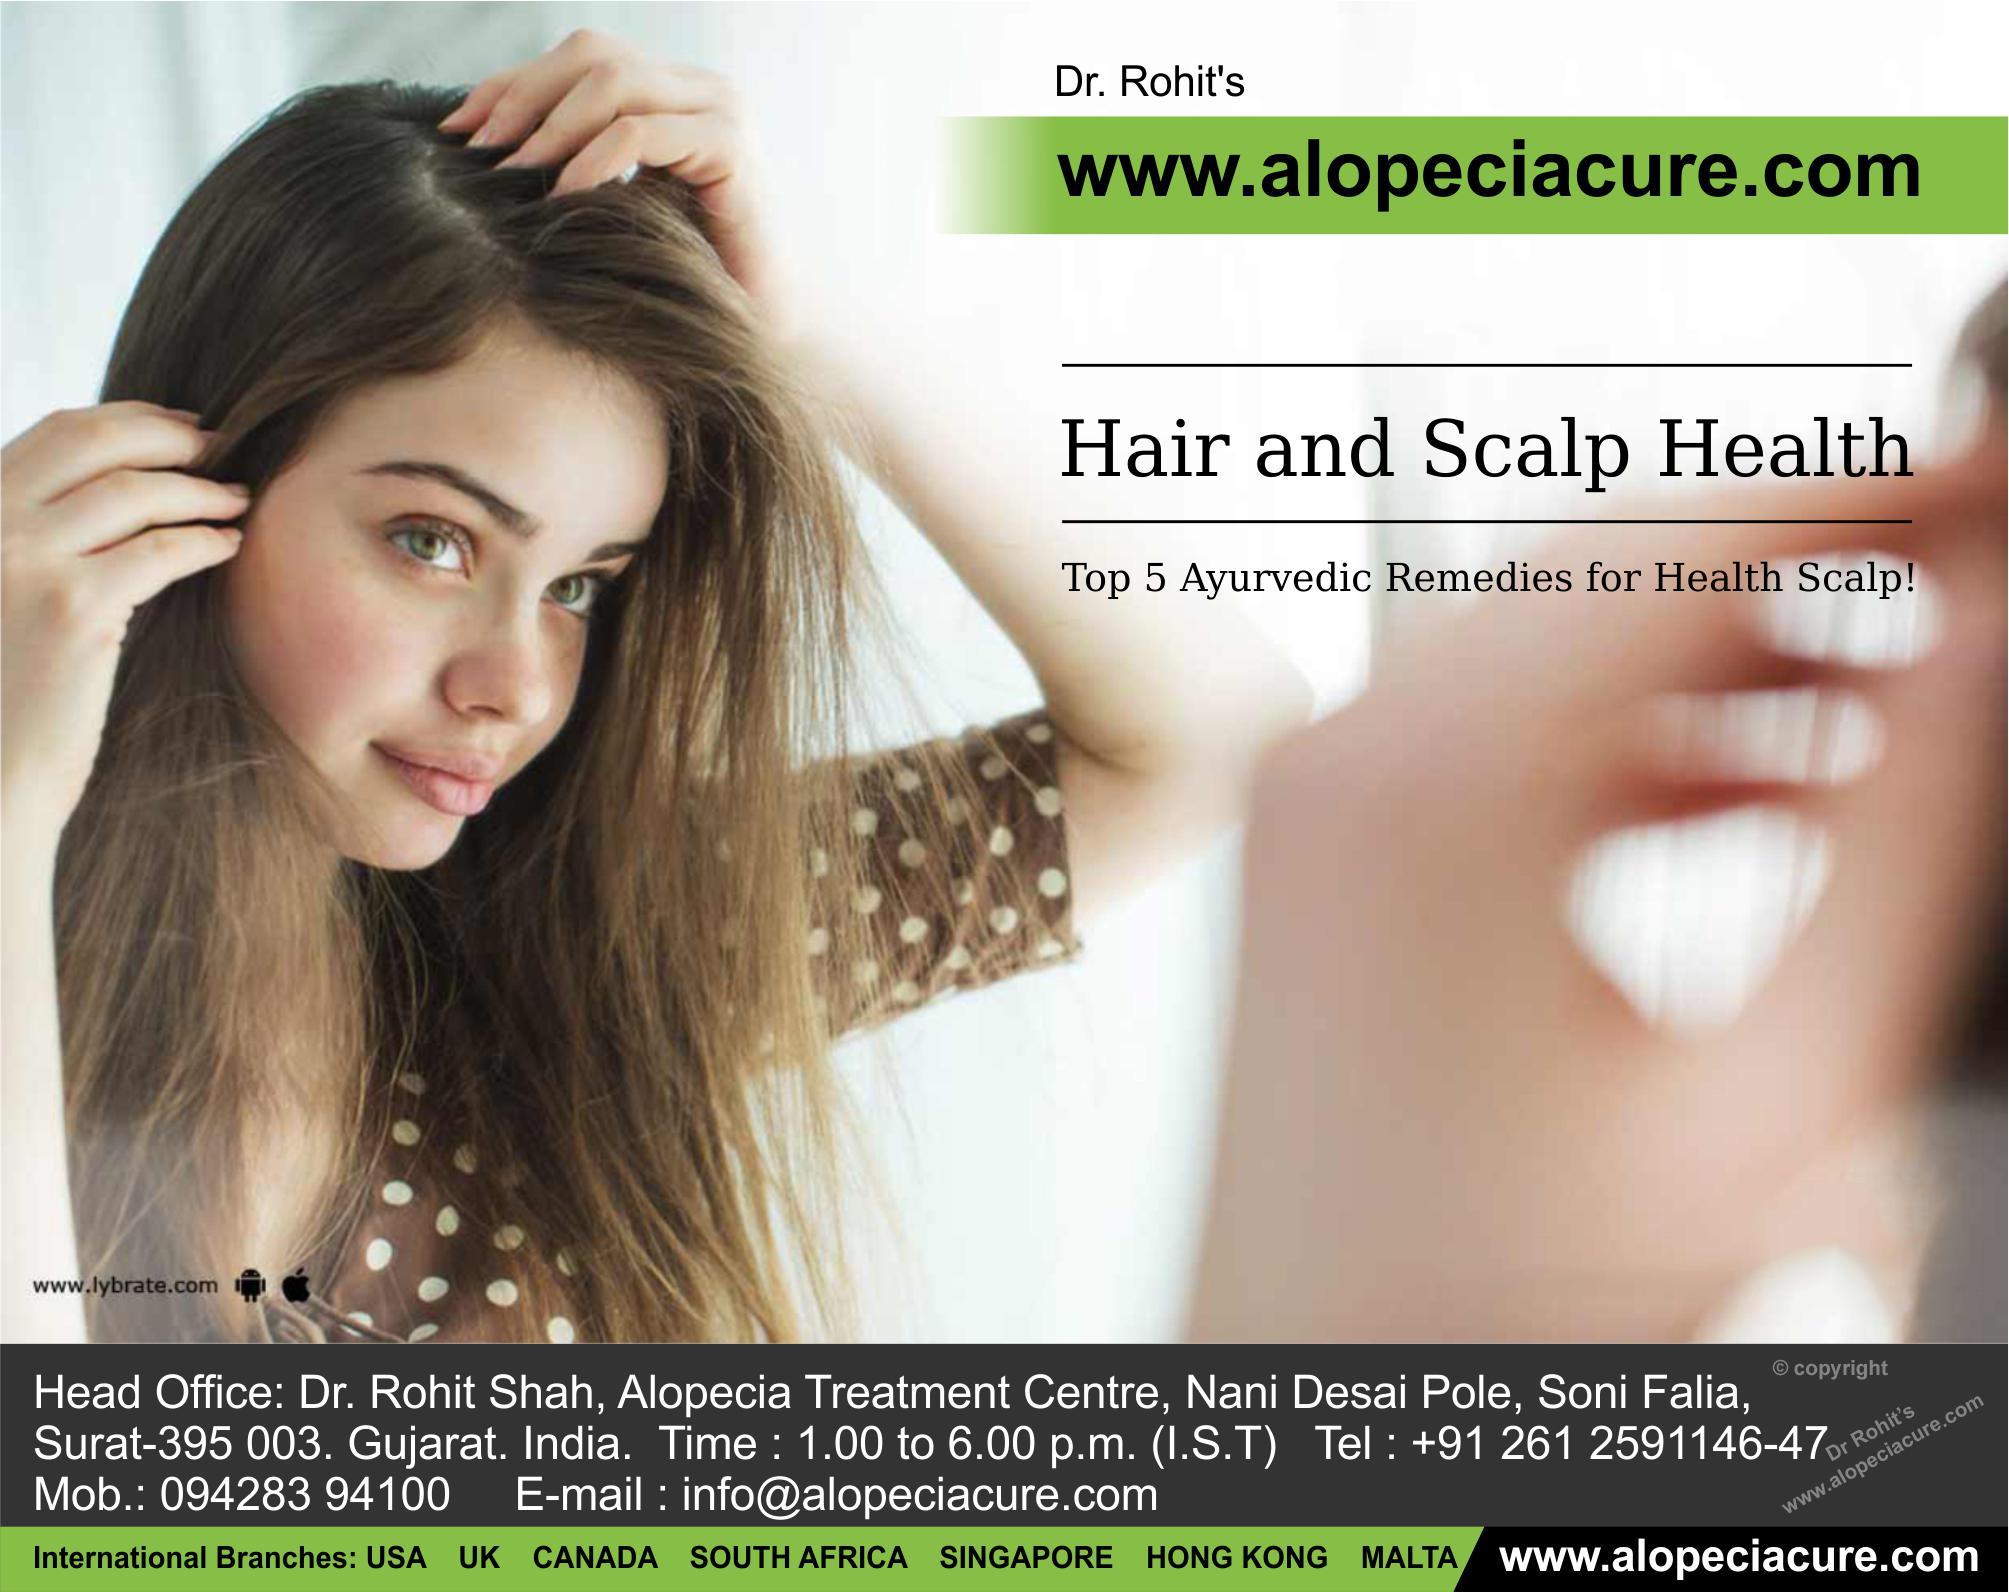 Ayurvedic Remedies for Healthy Scalp